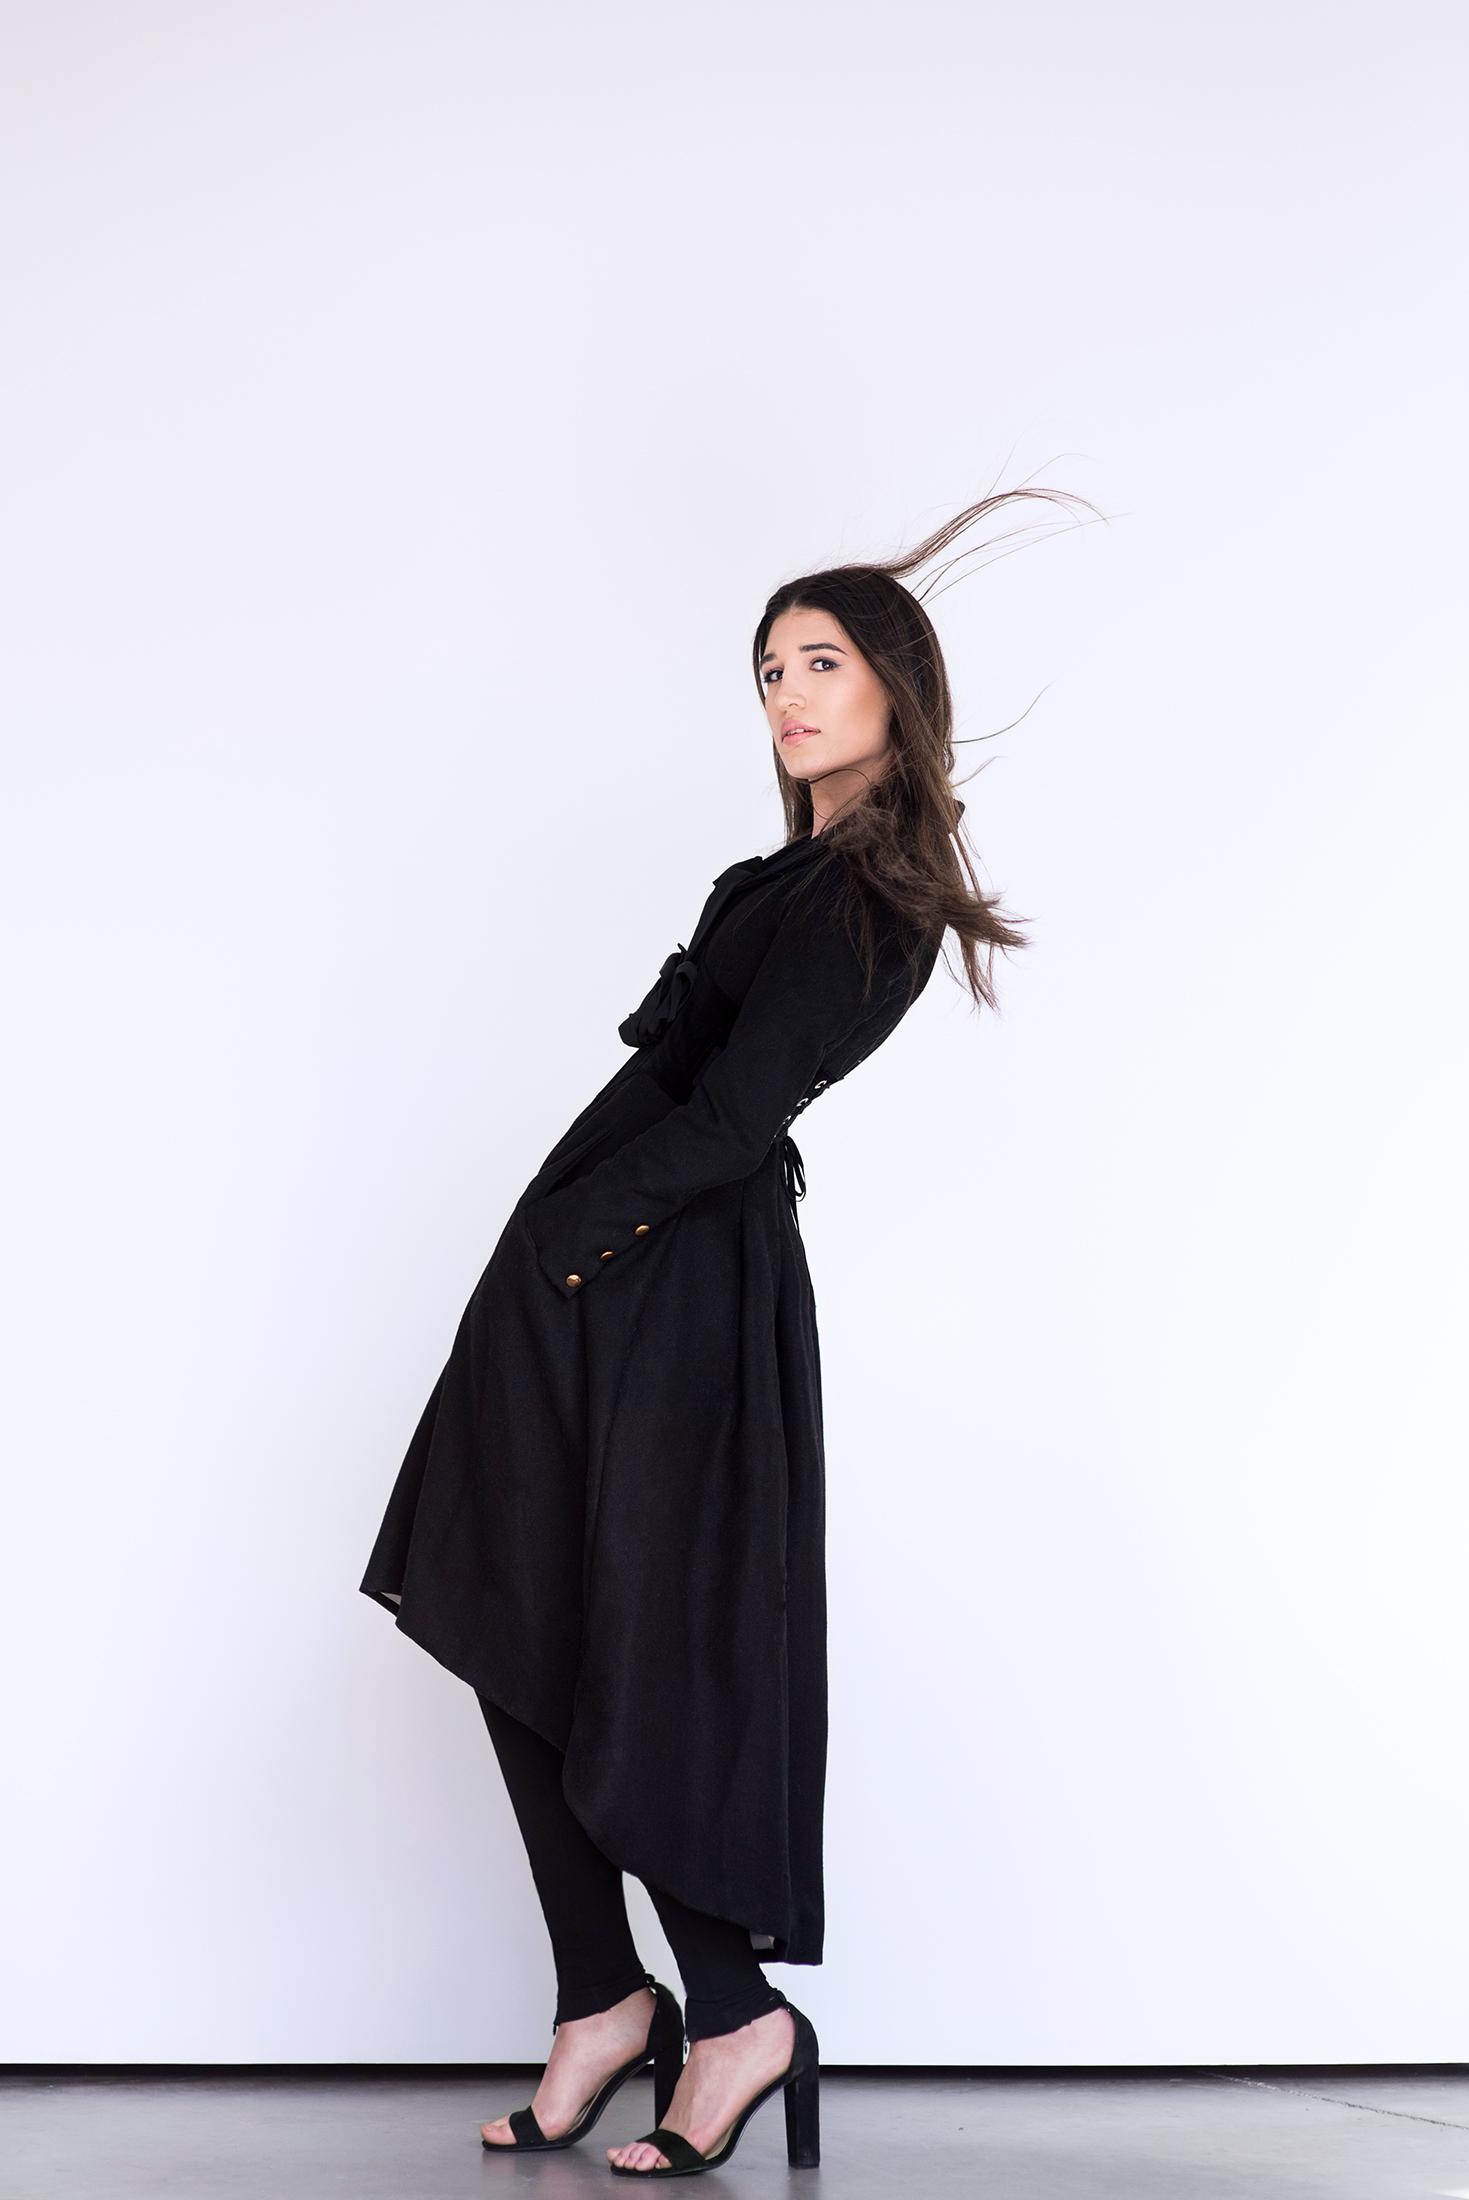 sf-fashion-photographer-tiana-hunter-22web.jpg